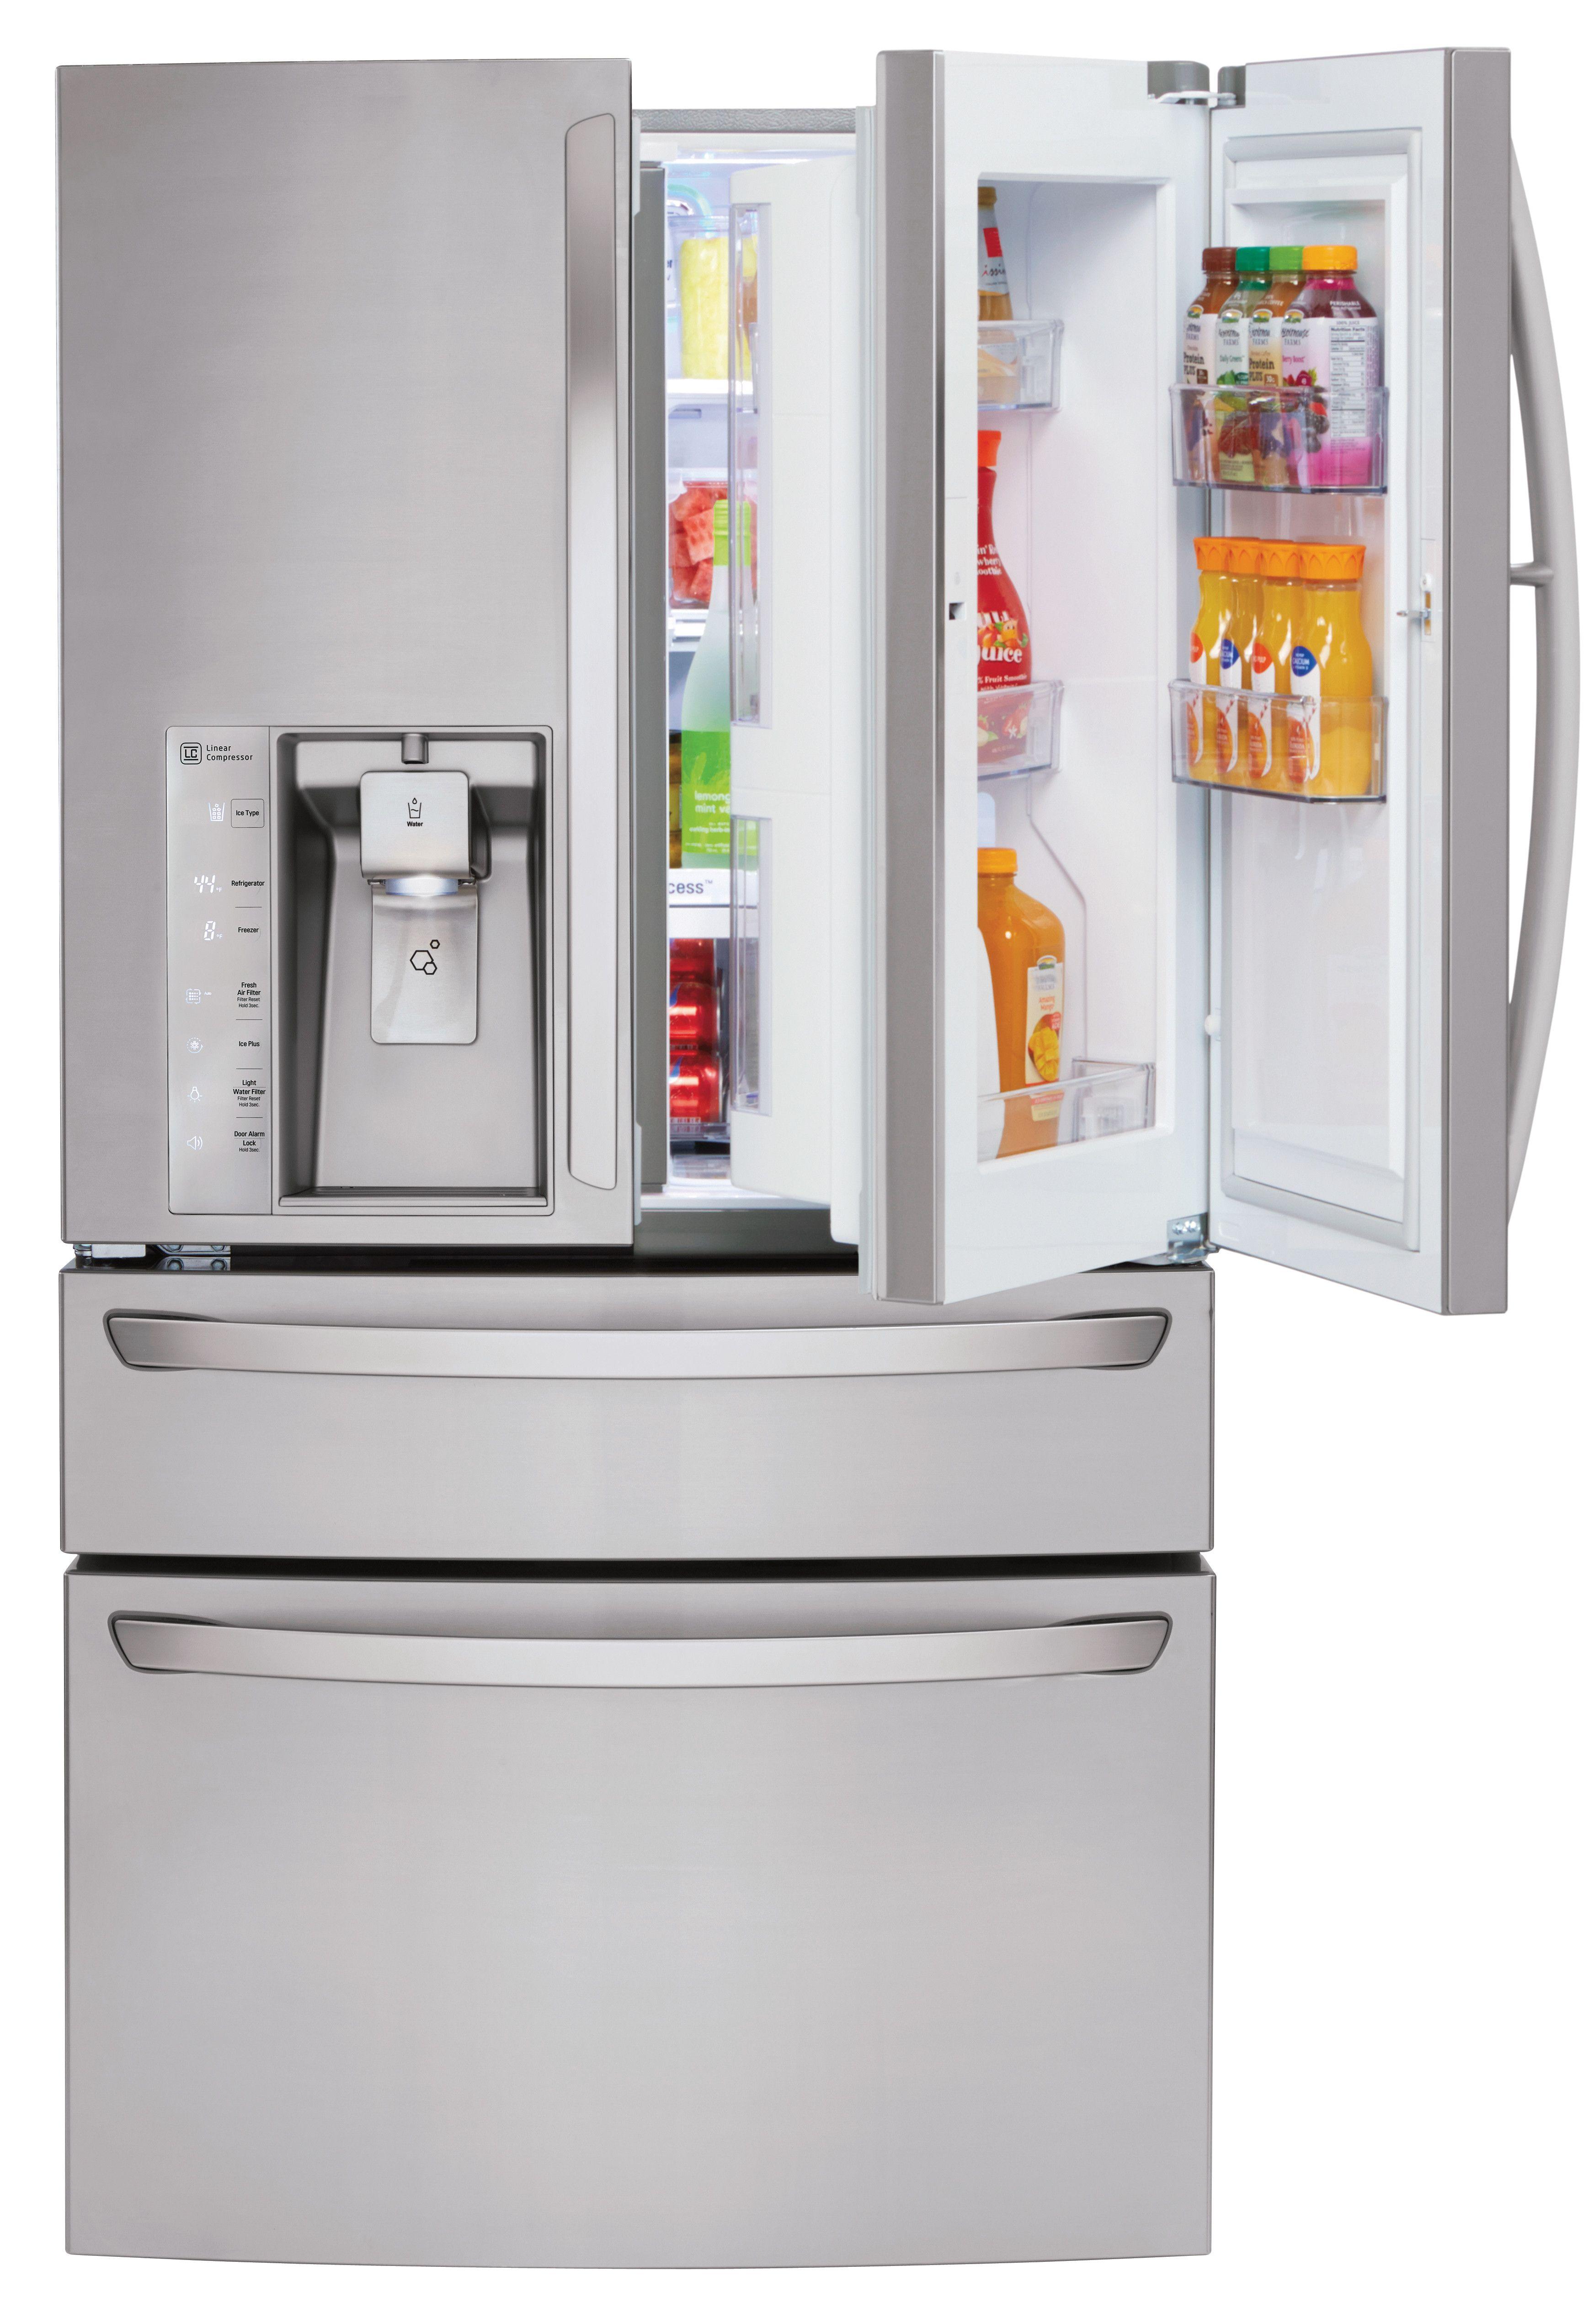 Samsung Refrigerator Demo Mode How To Turn Off Samsung